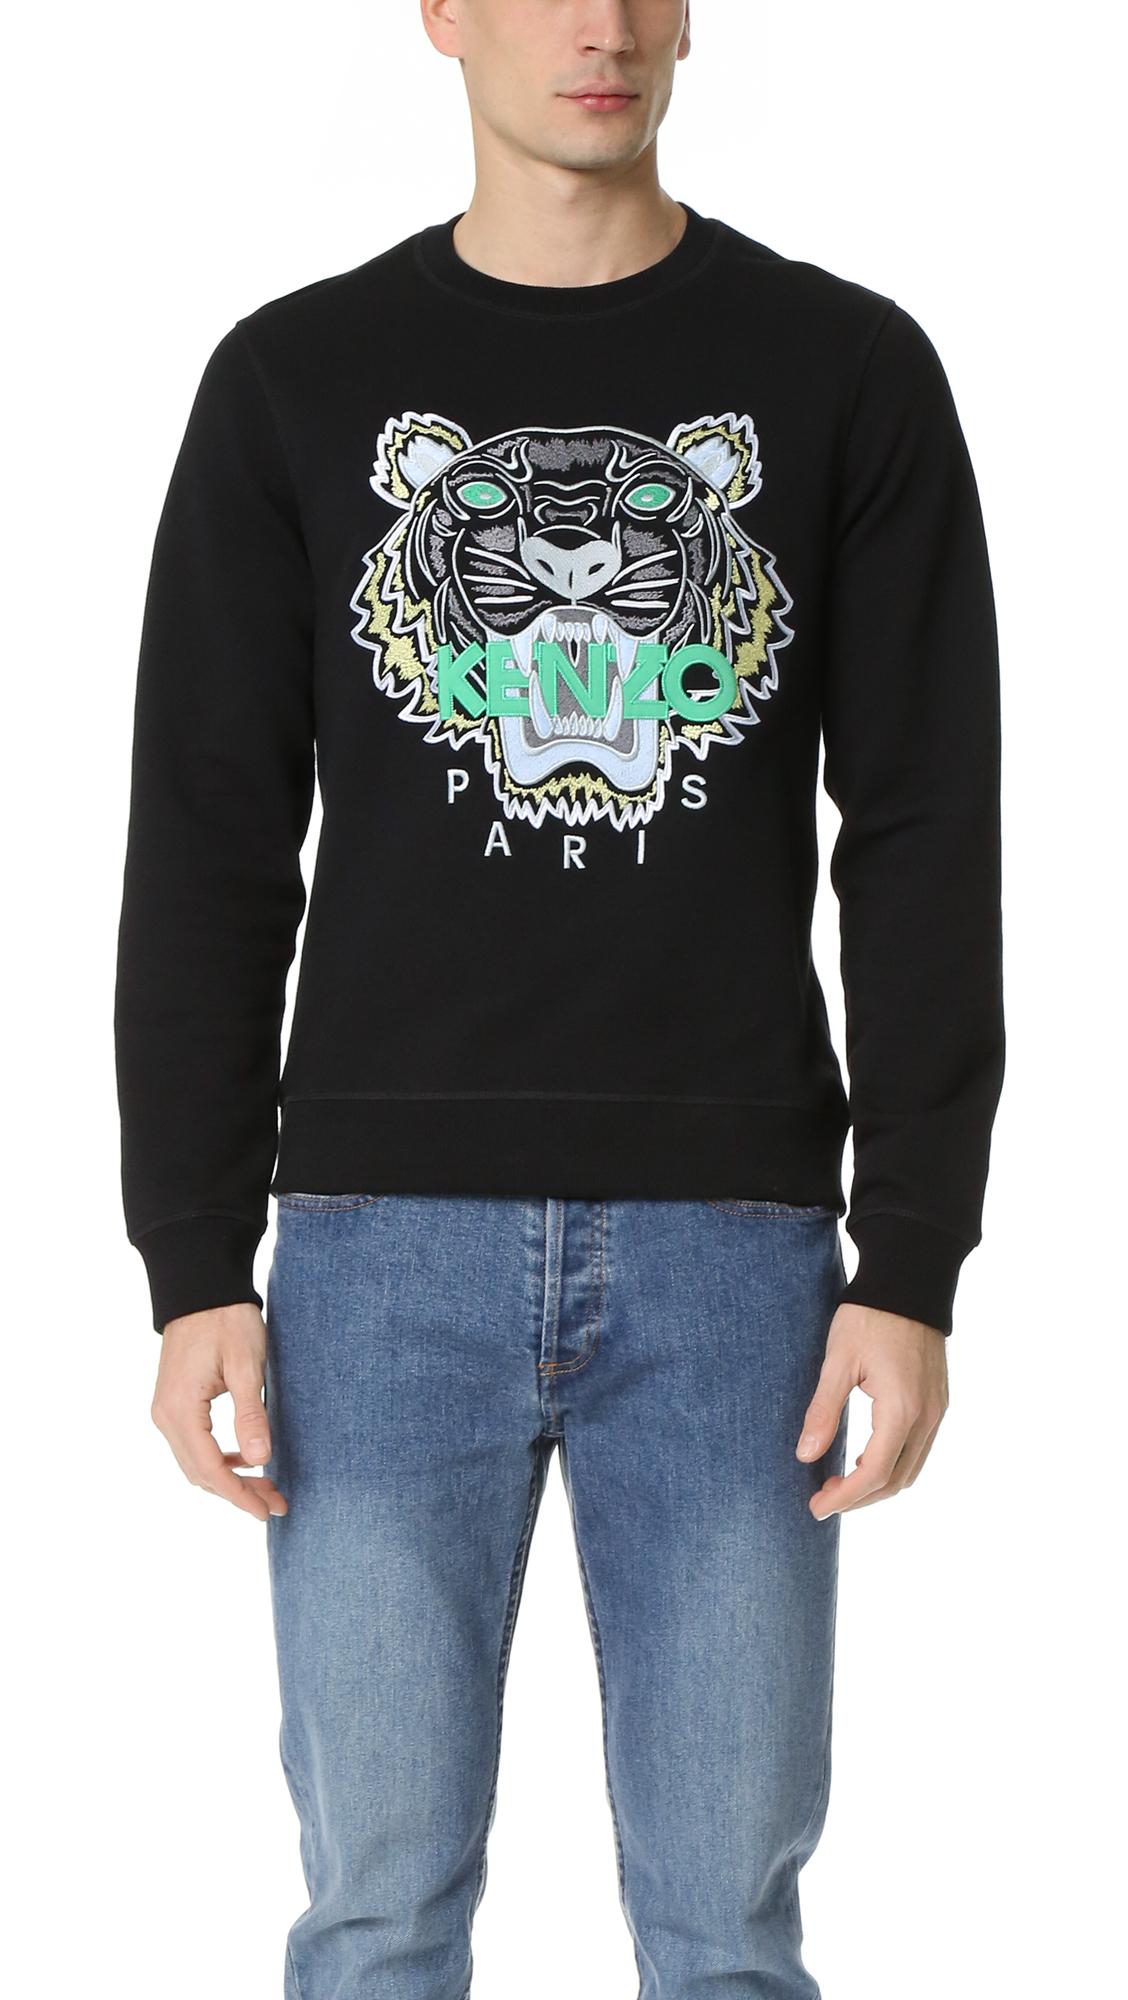 930e31f9 KENZO Cotton Sweatpants - Black in Black for Men - Lyst